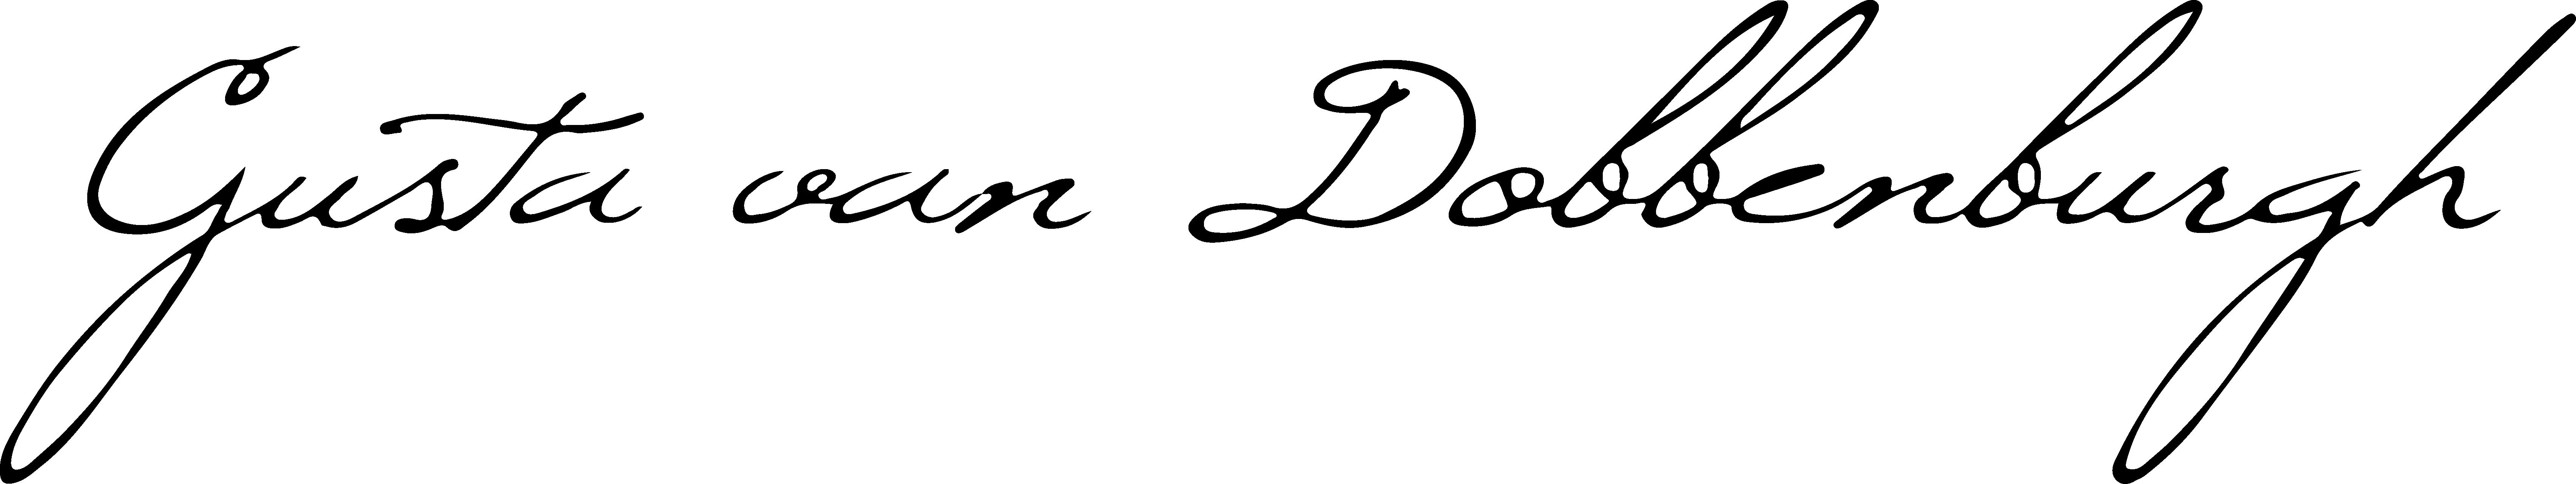 Gusta Van Dobbenburgh's Signature